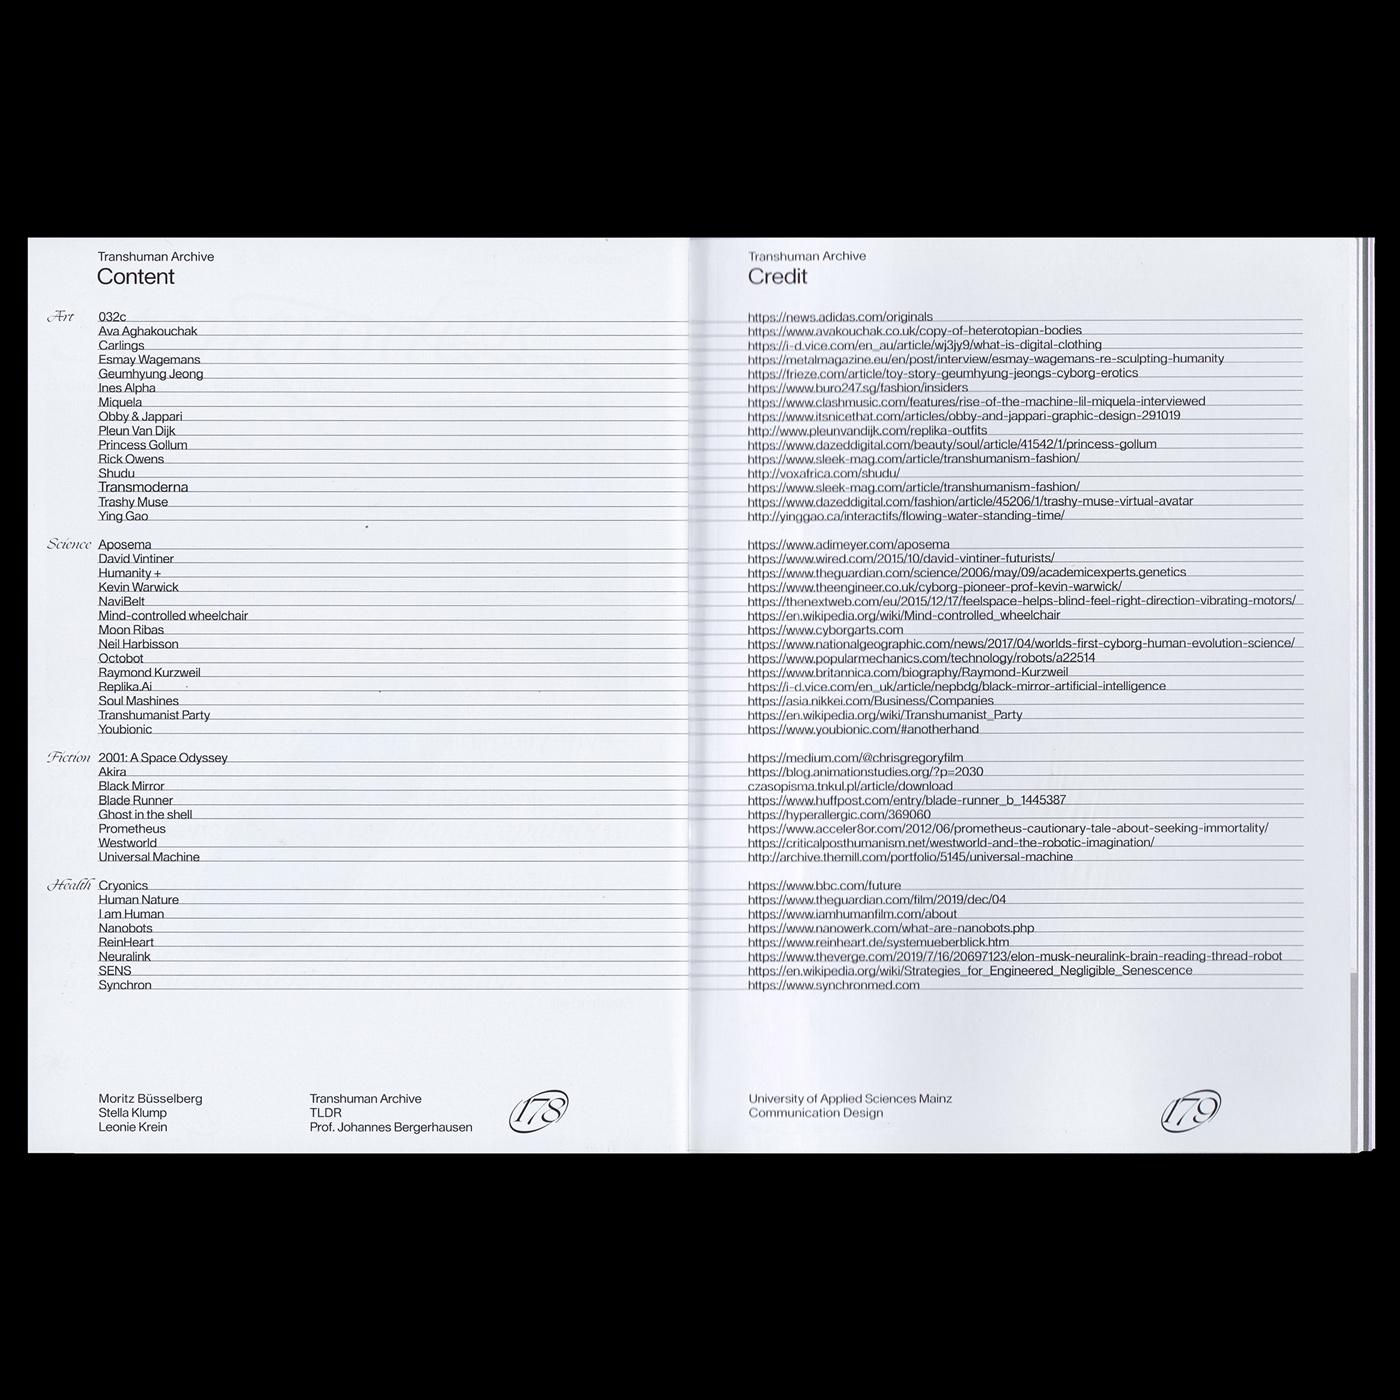 04 collide24 Transhuman Archive Stella Klump Leonie Krein Moritz Büsselberg - The book 'Transhuman Archive' by Stella Klump, Leonie Krein and Moritz Büsselberg explores the effects of transhumanism in our times